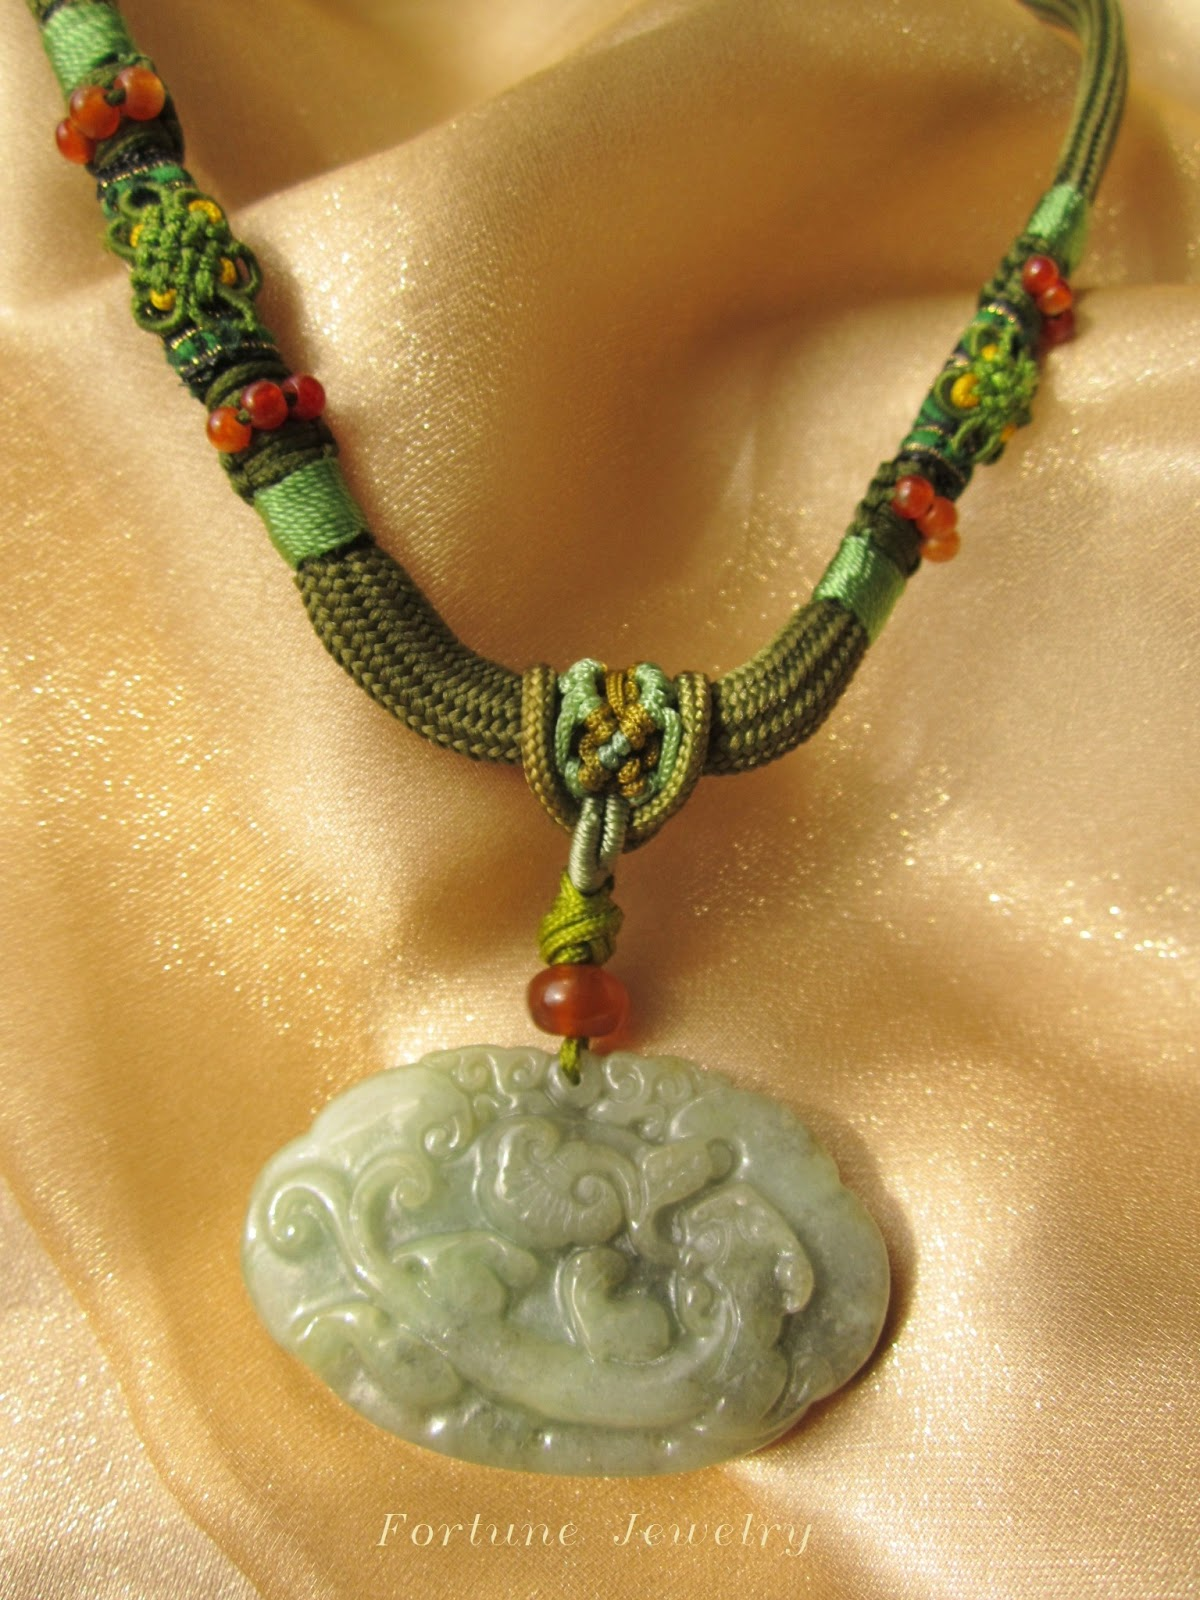 fortune jewelry healing ru yi tiger carved